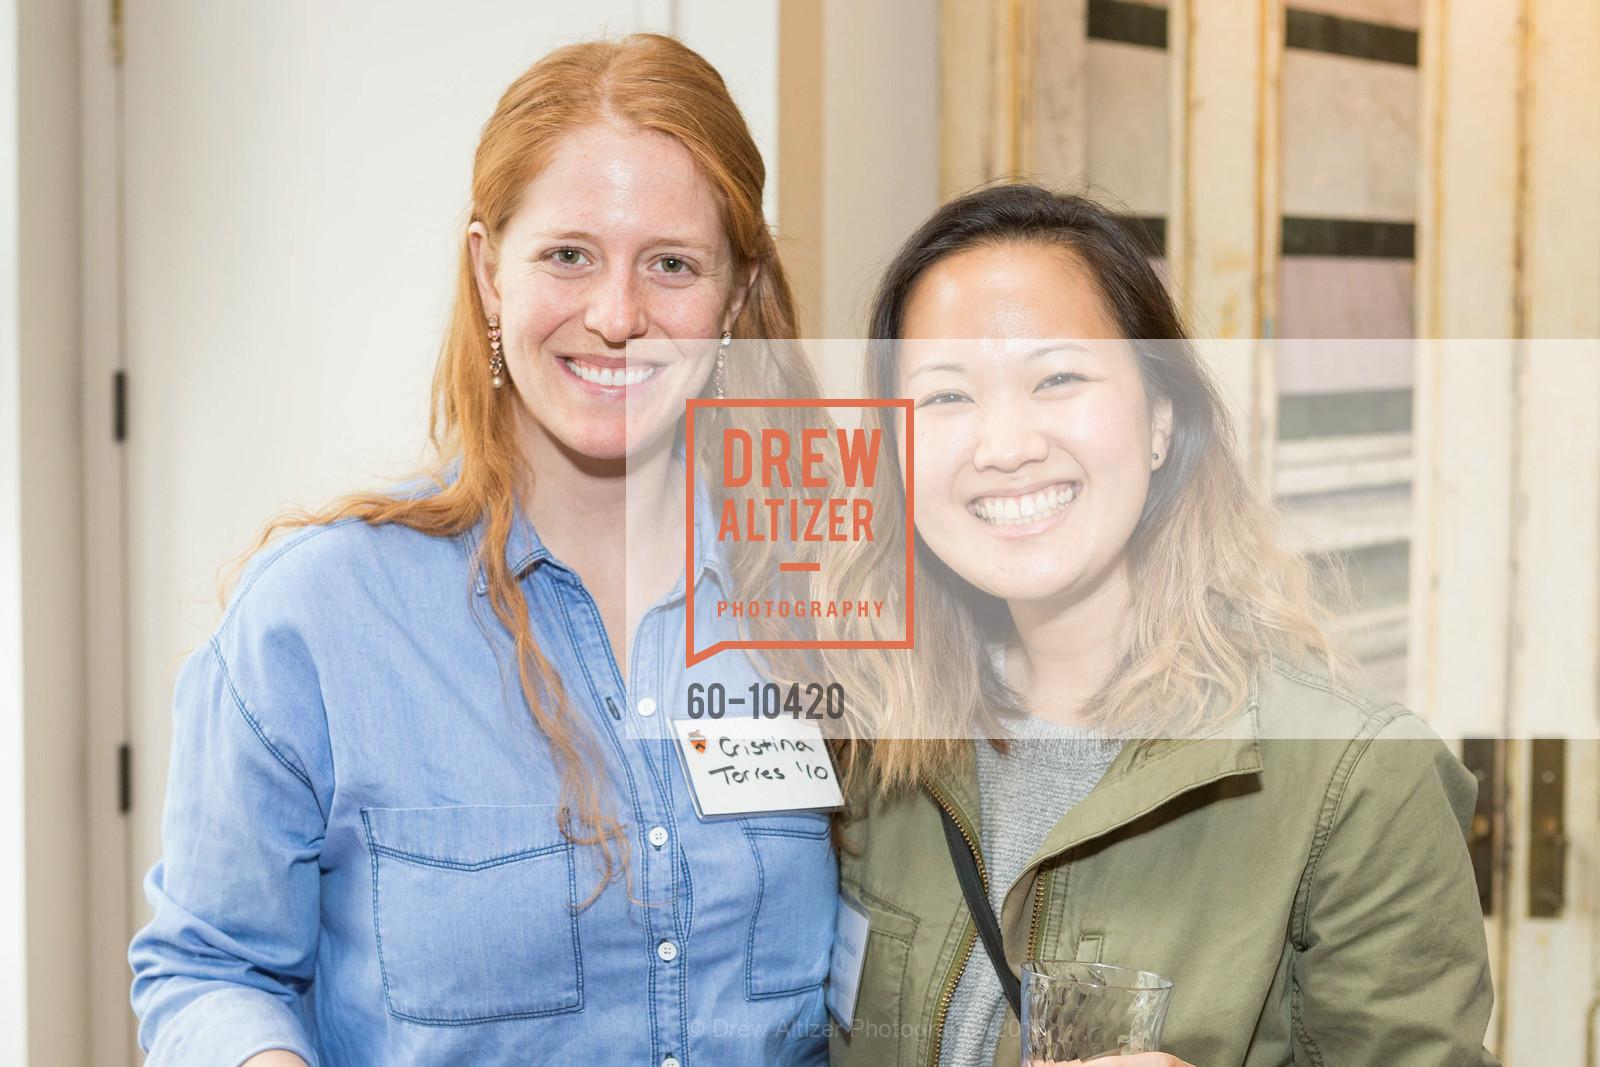 Top Picks, Princeton club of Northern California Princeton and Slavery talk 2018, April 15th, 2018, Photo